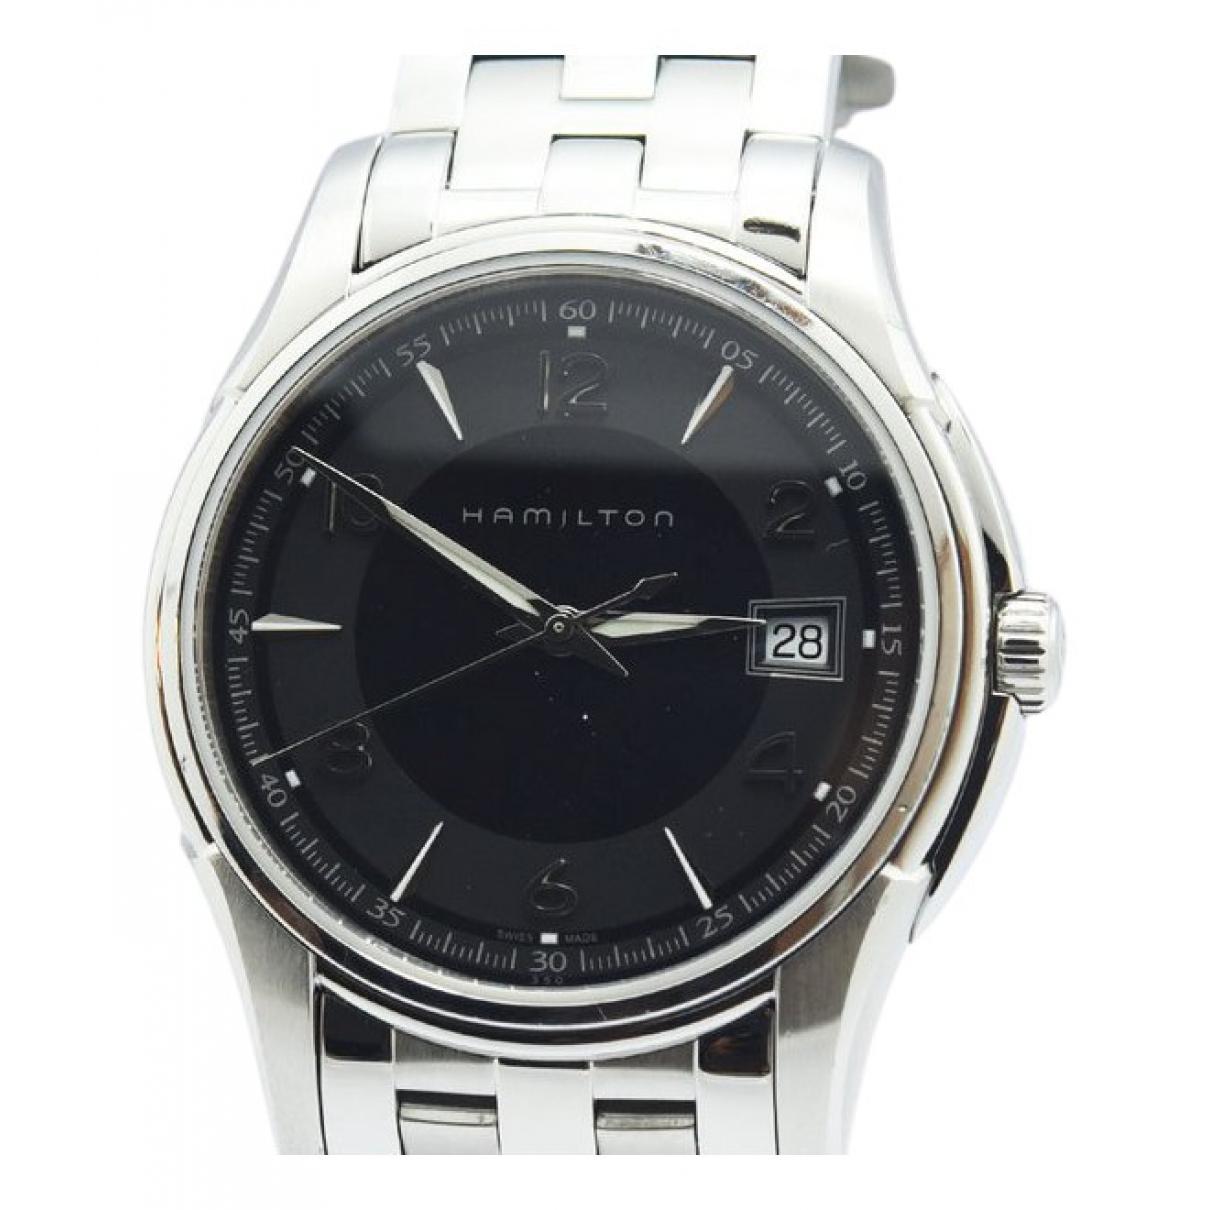 Hamilton Jazzmaster Maestro Chronographe Uhr in  Schwarz Stahl